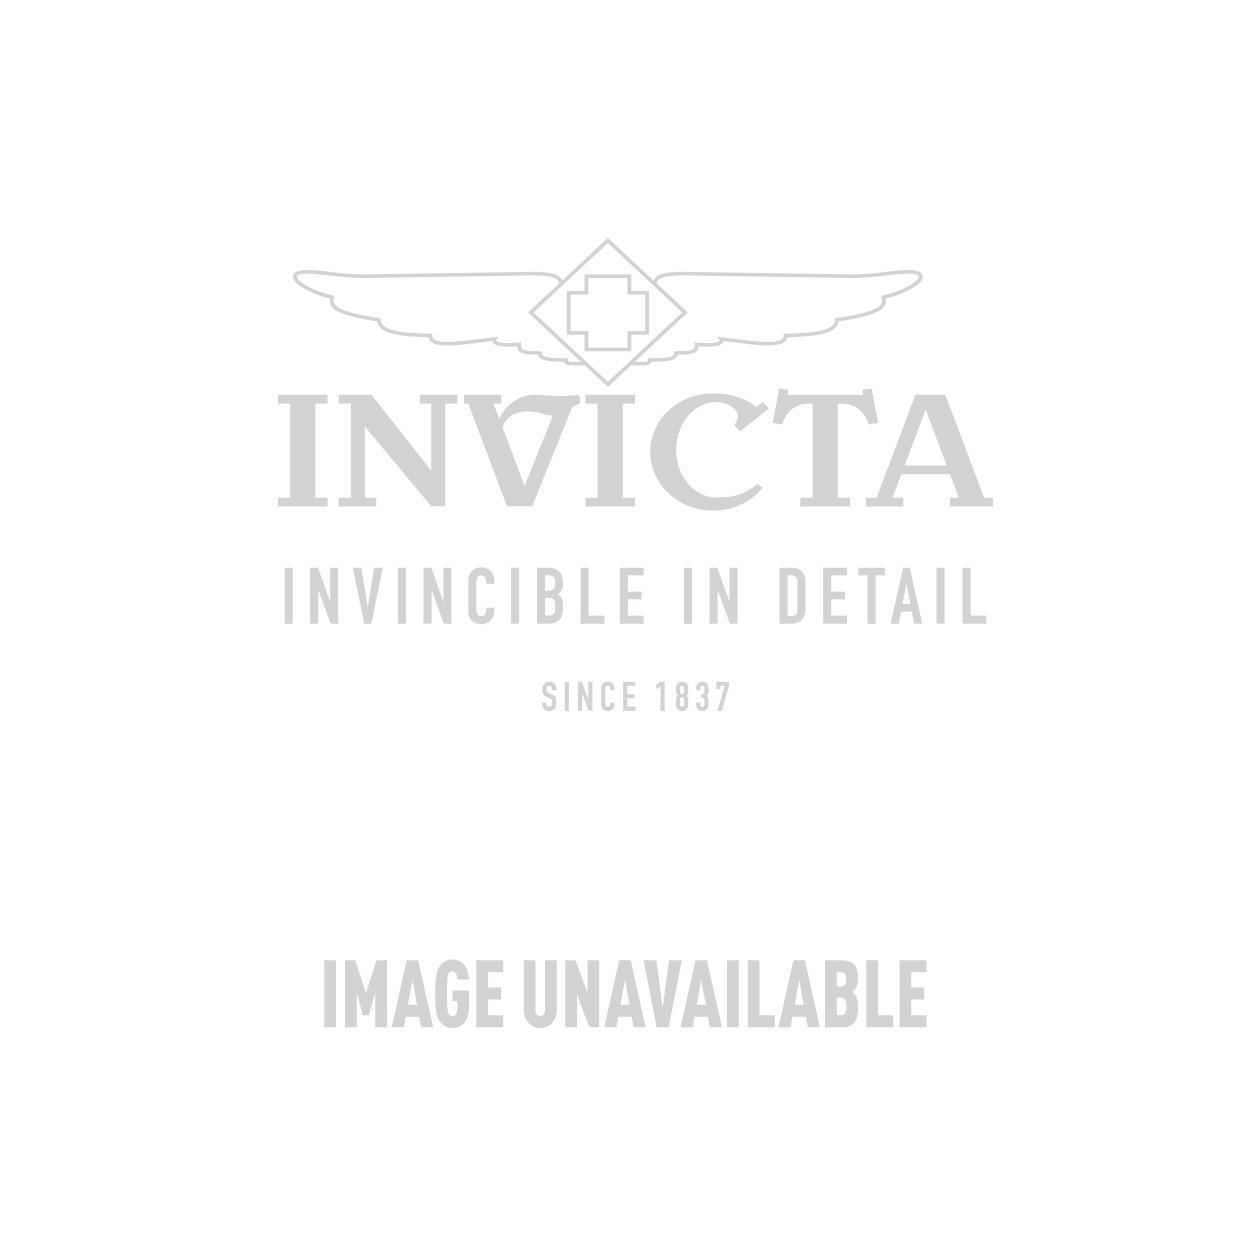 b758360131c Invicta DC Comics Limited Edition Flash Mens Automatic 52mm Gold Case Gold  Dial - Model 26827